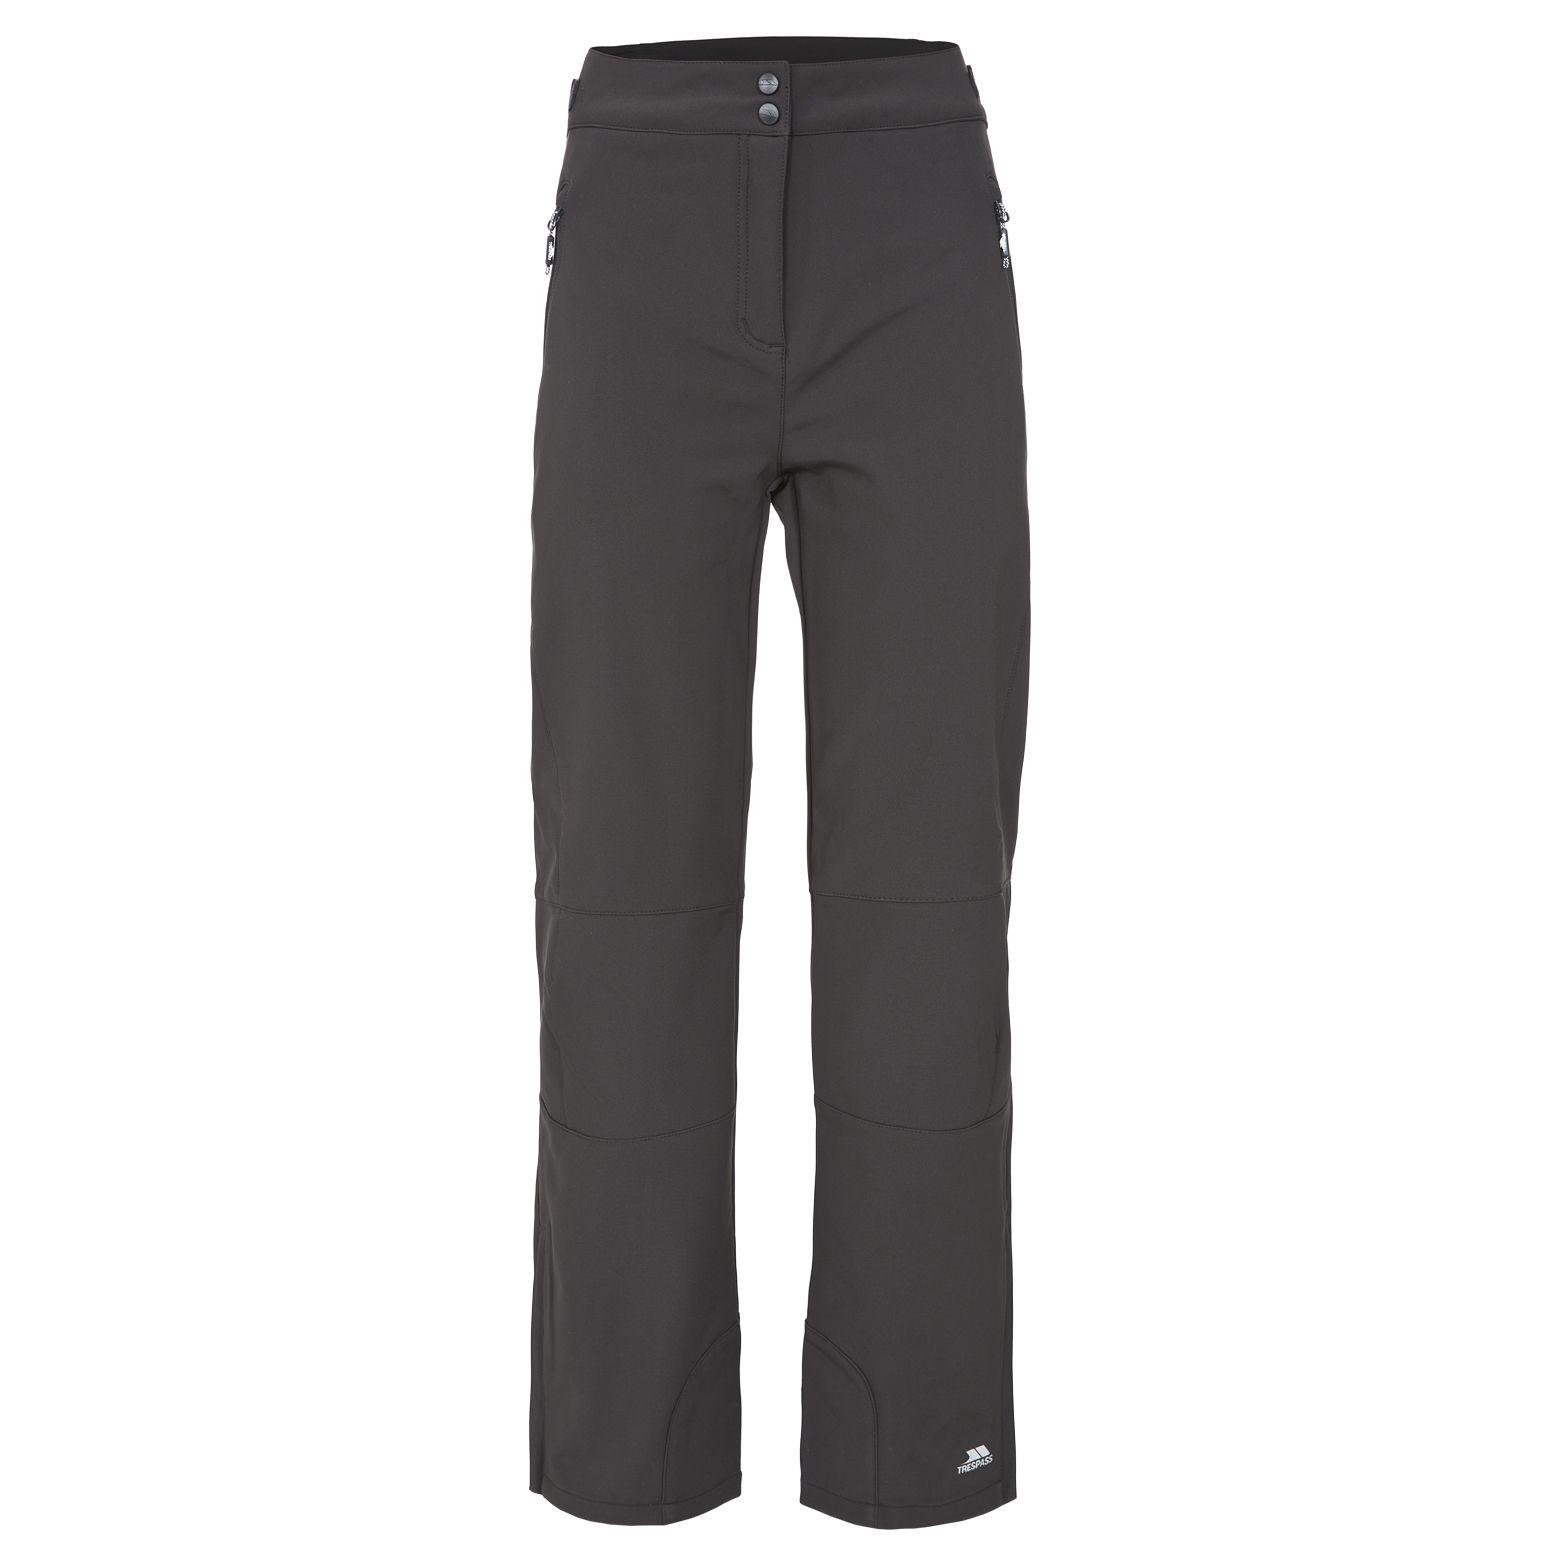 Squidge Ii Womens Water Resistant Softshell Trousers